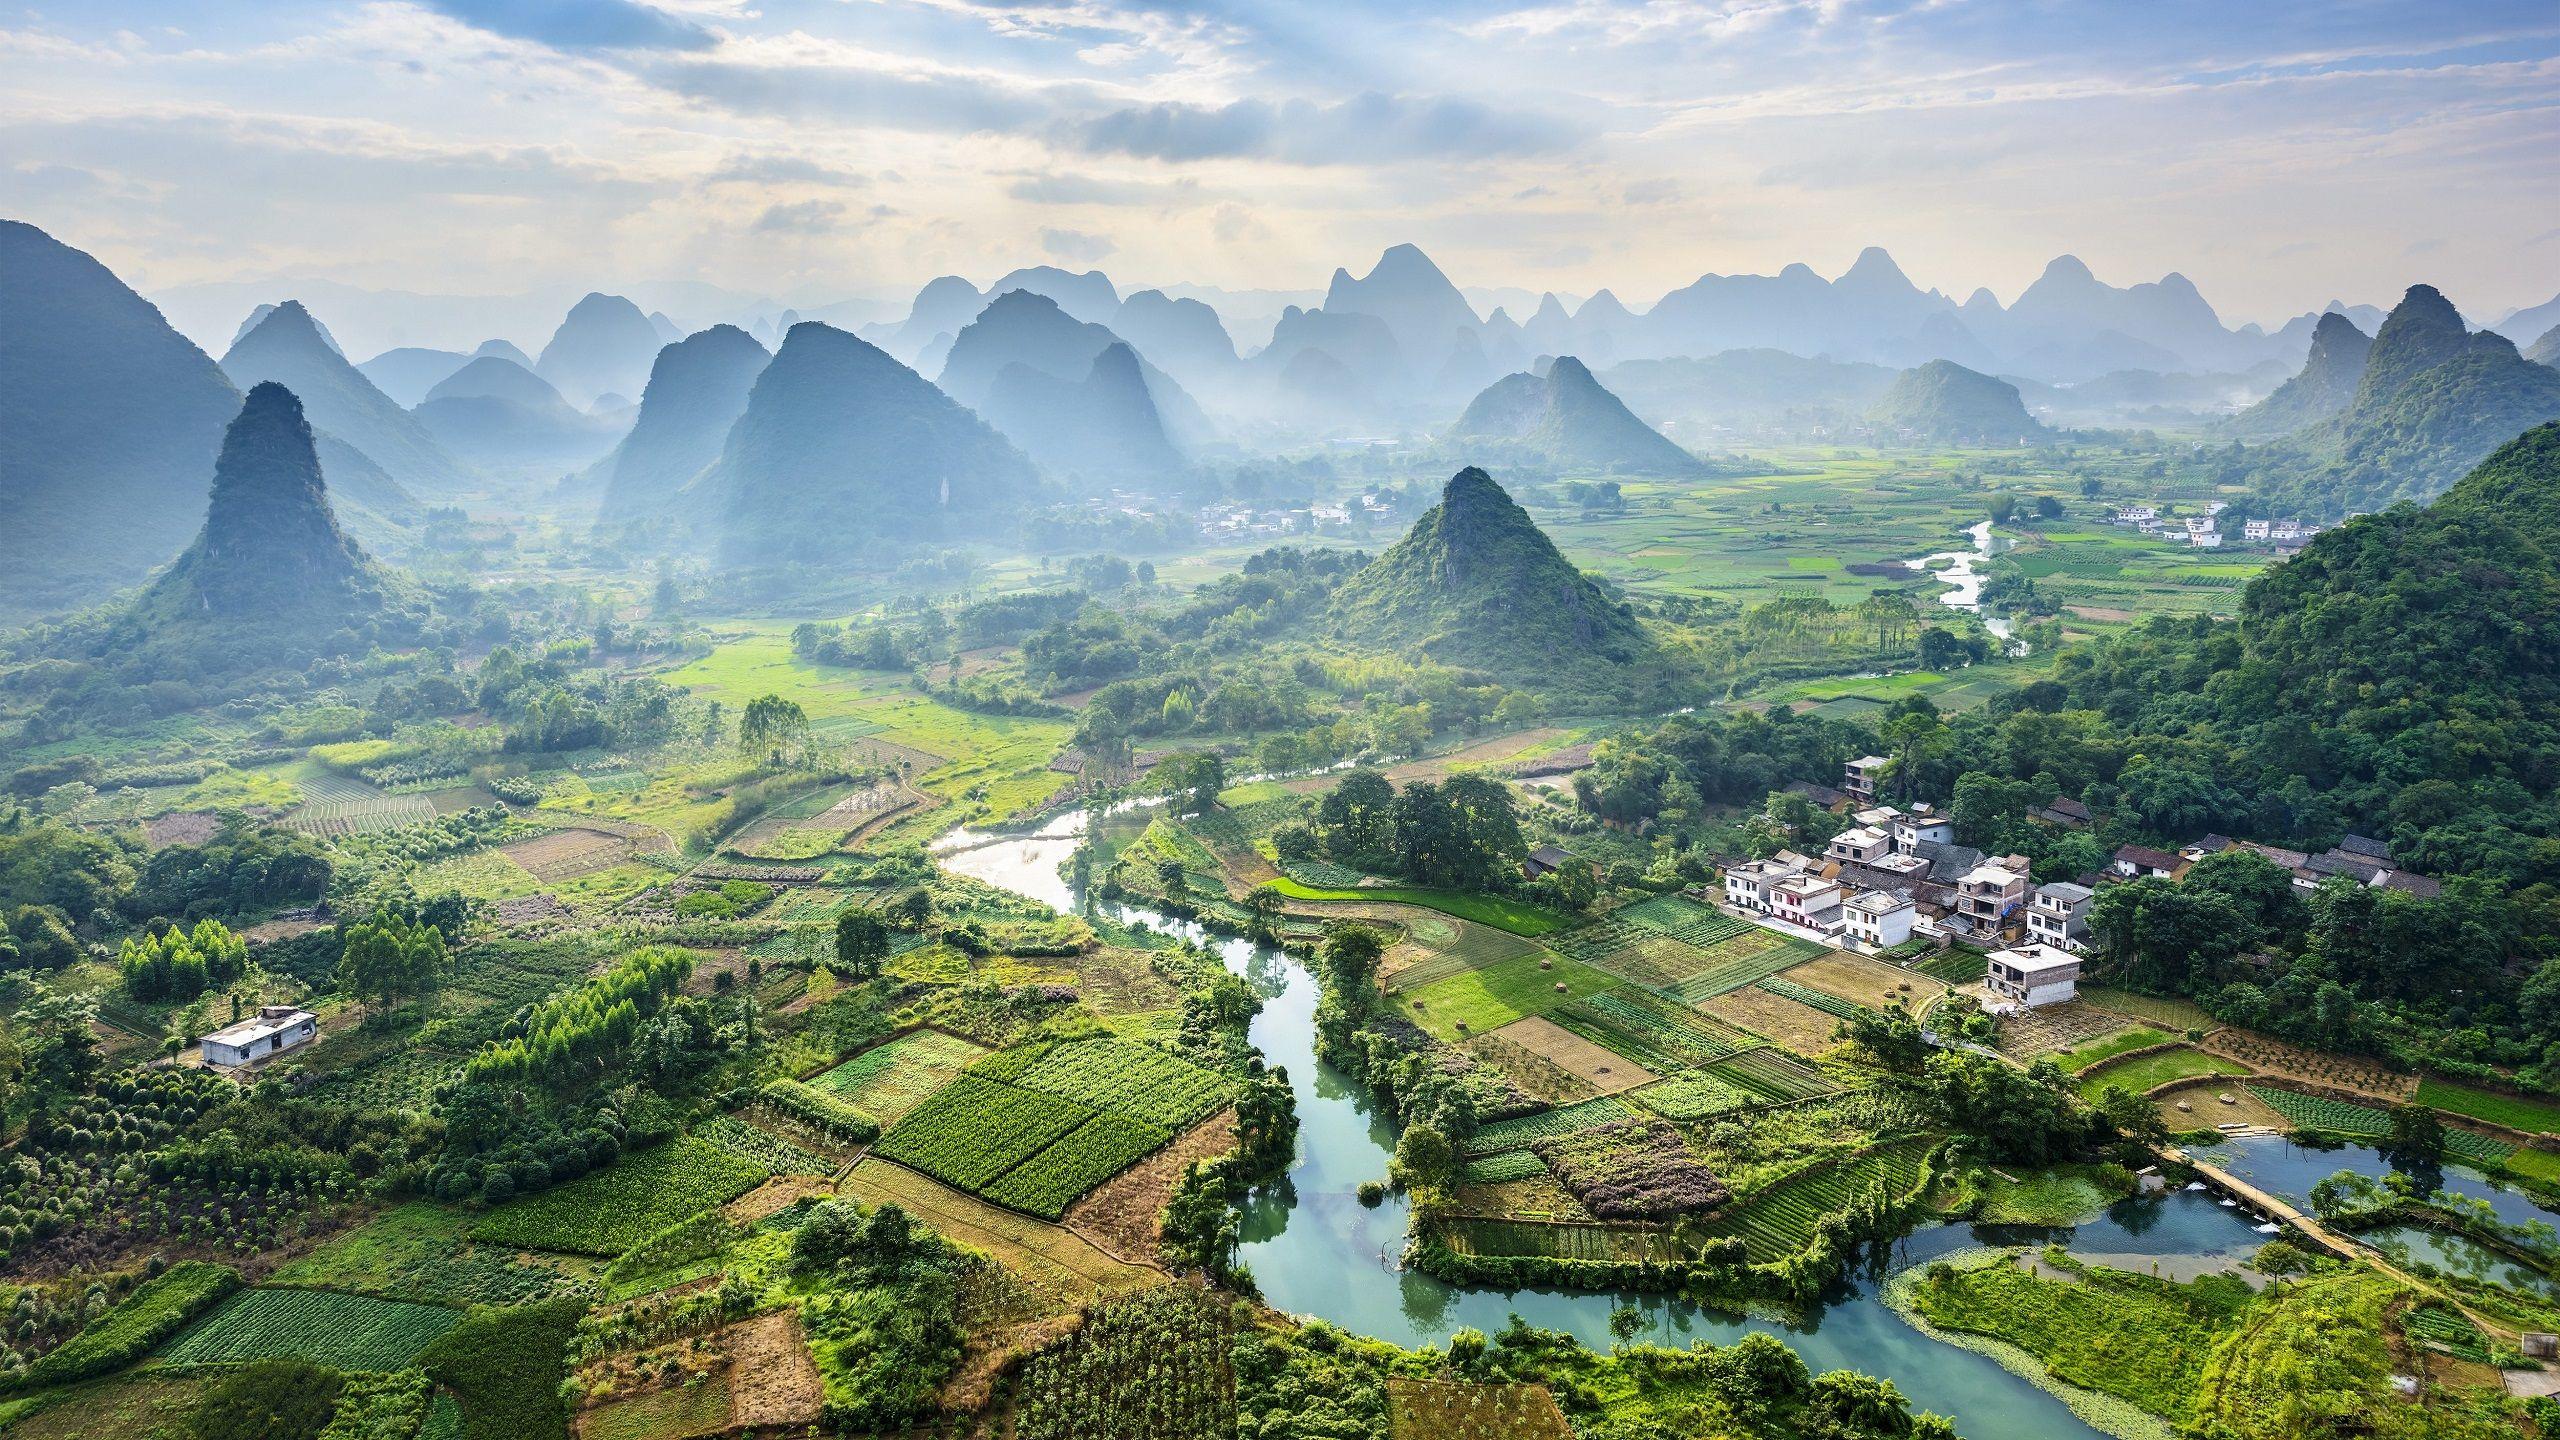 #landscape#nature#China#village#Asia#hill#hills#river#field#aerialview